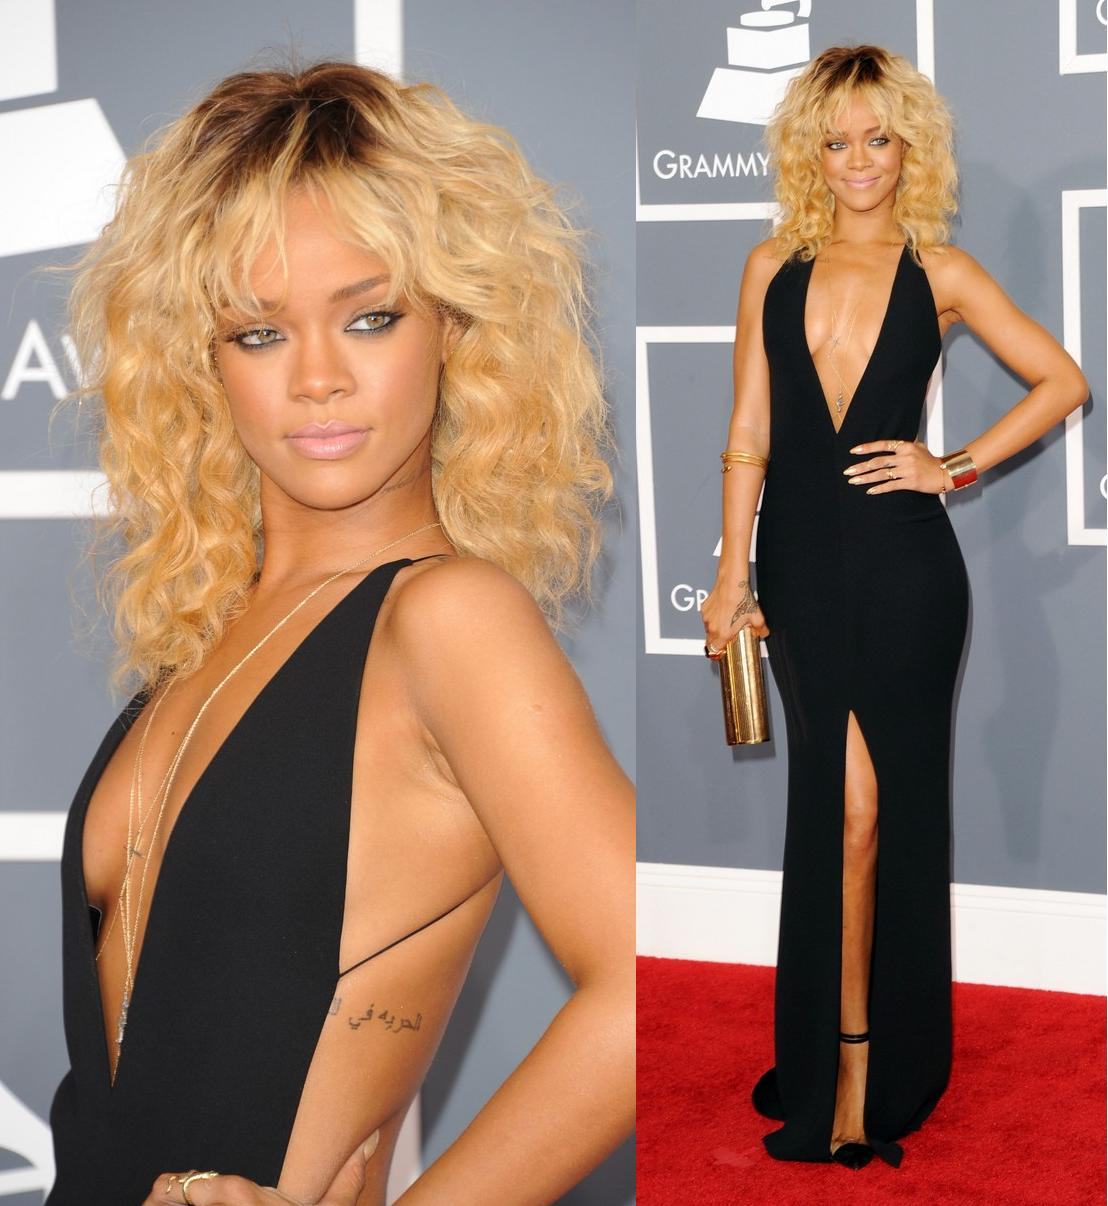 http://1.bp.blogspot.com/-WfKzz7verWg/TzqL6ymyvOI/AAAAAAAAE4Y/0X6AE9q_5NY/s1600/Rihanna+In+Giorgio+Armani+-+2012+Grammys.jpg